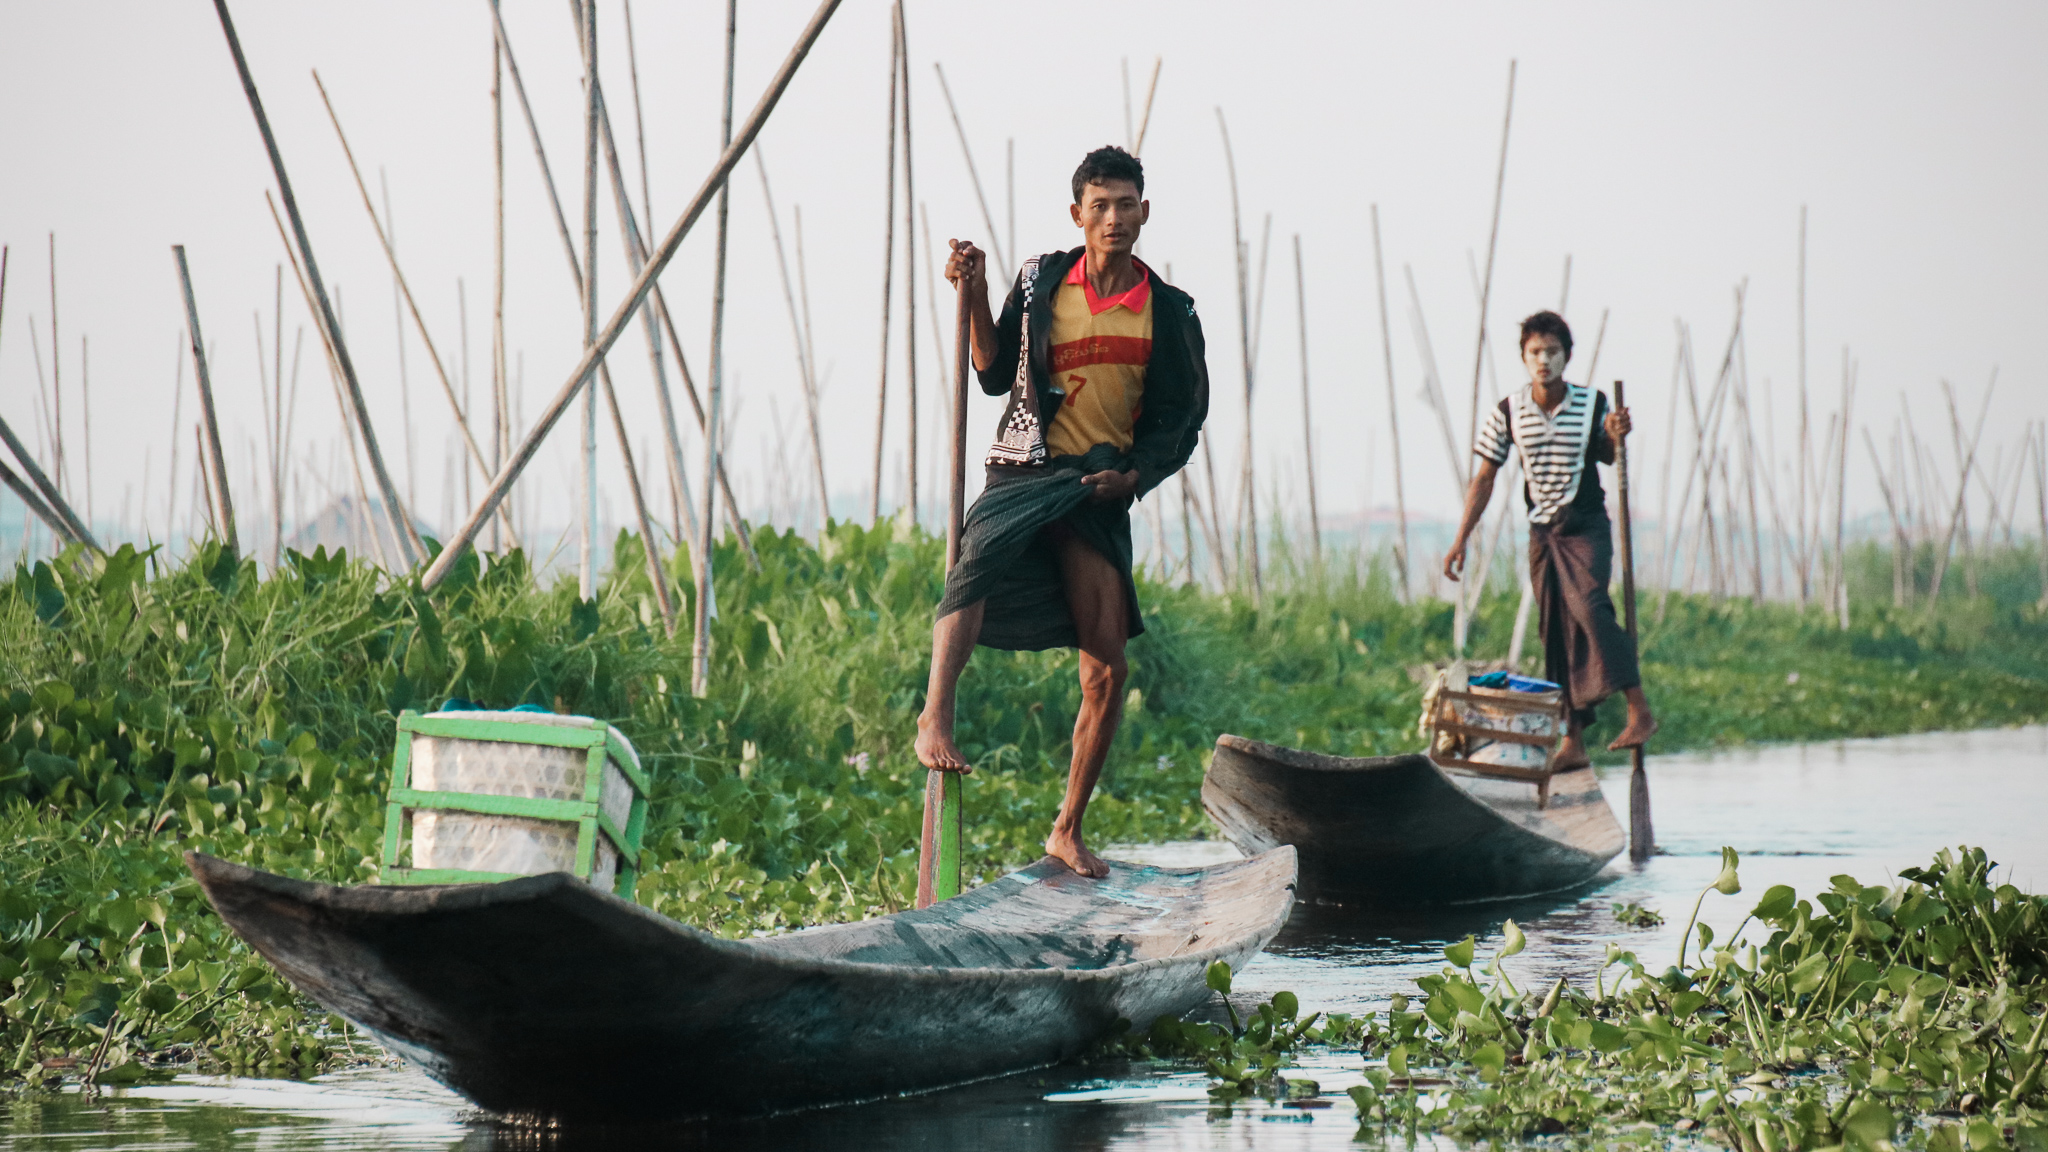 Boatman on Inle Lake, Myanmar